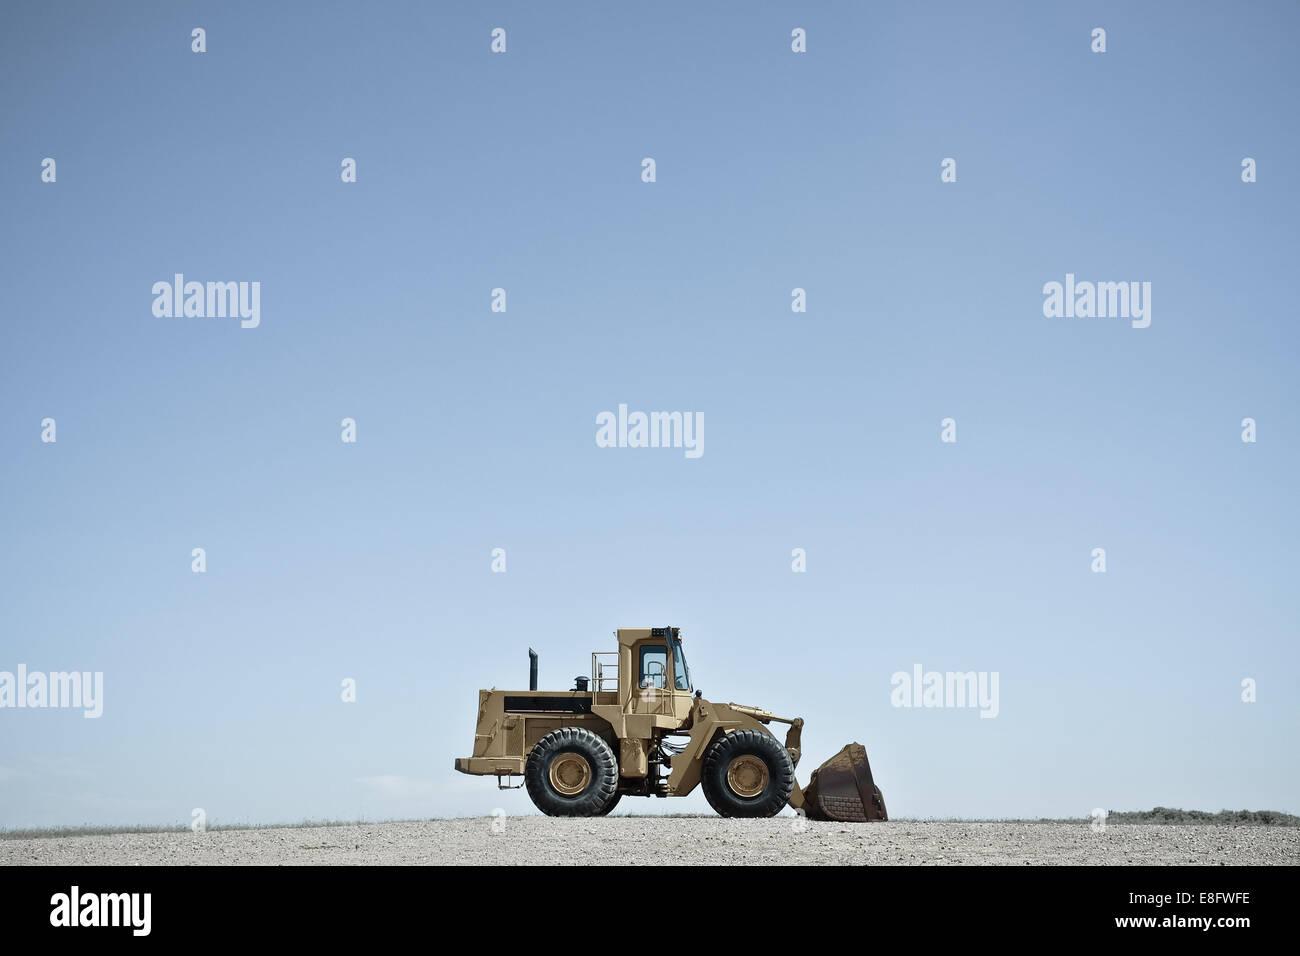 USA, Wyoming, Bulldozer against blue sky - Stock Image